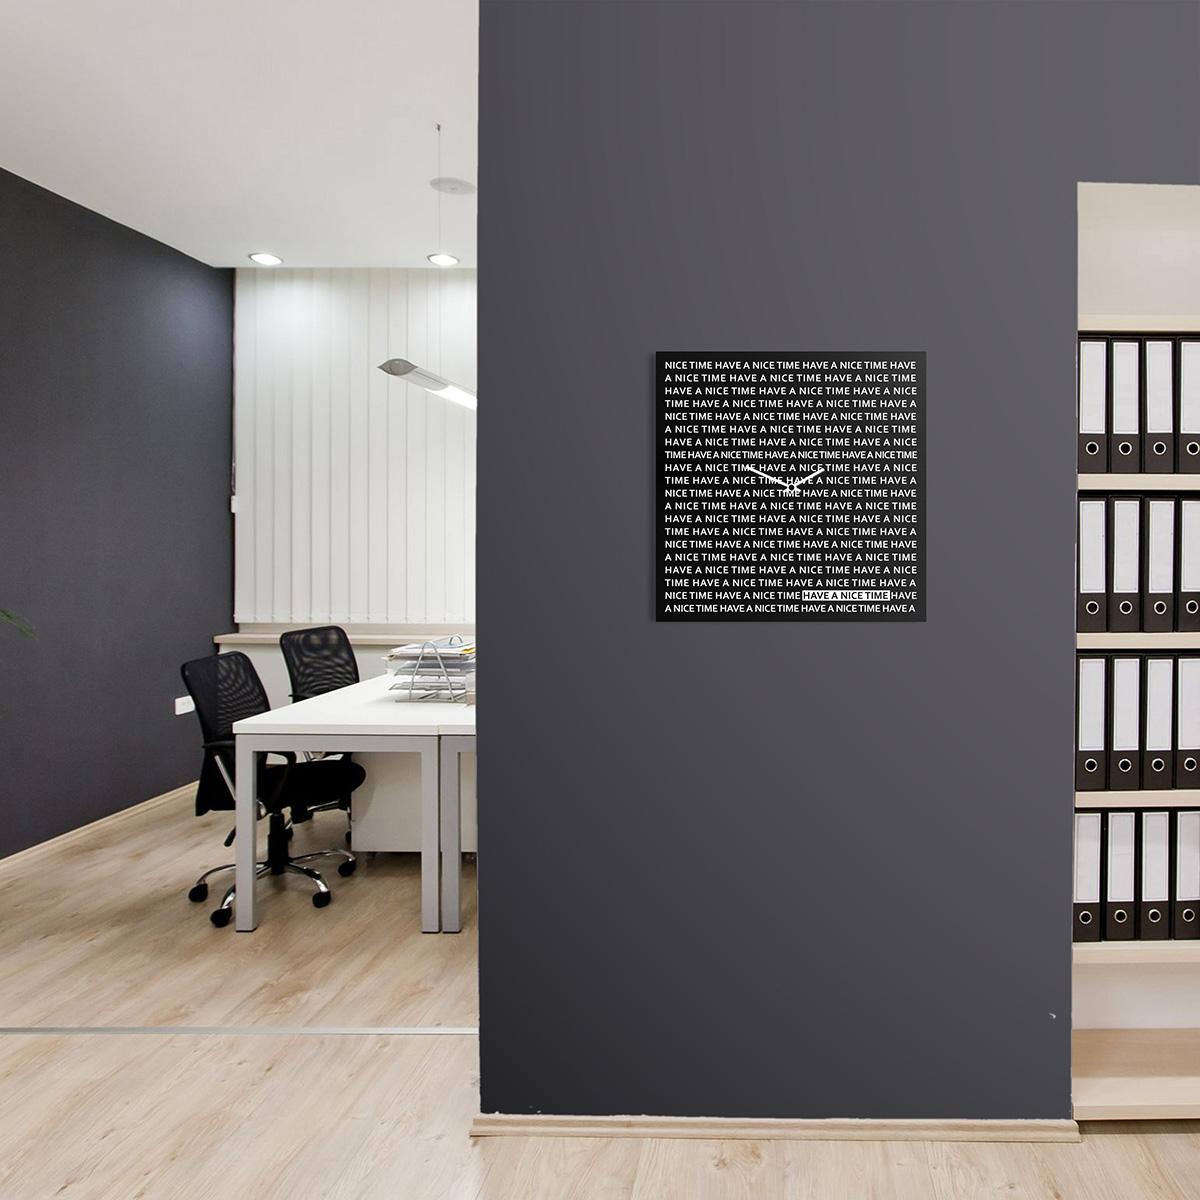 Nice time orologio da parete lavagna magnetica design - Orologio design parete ...